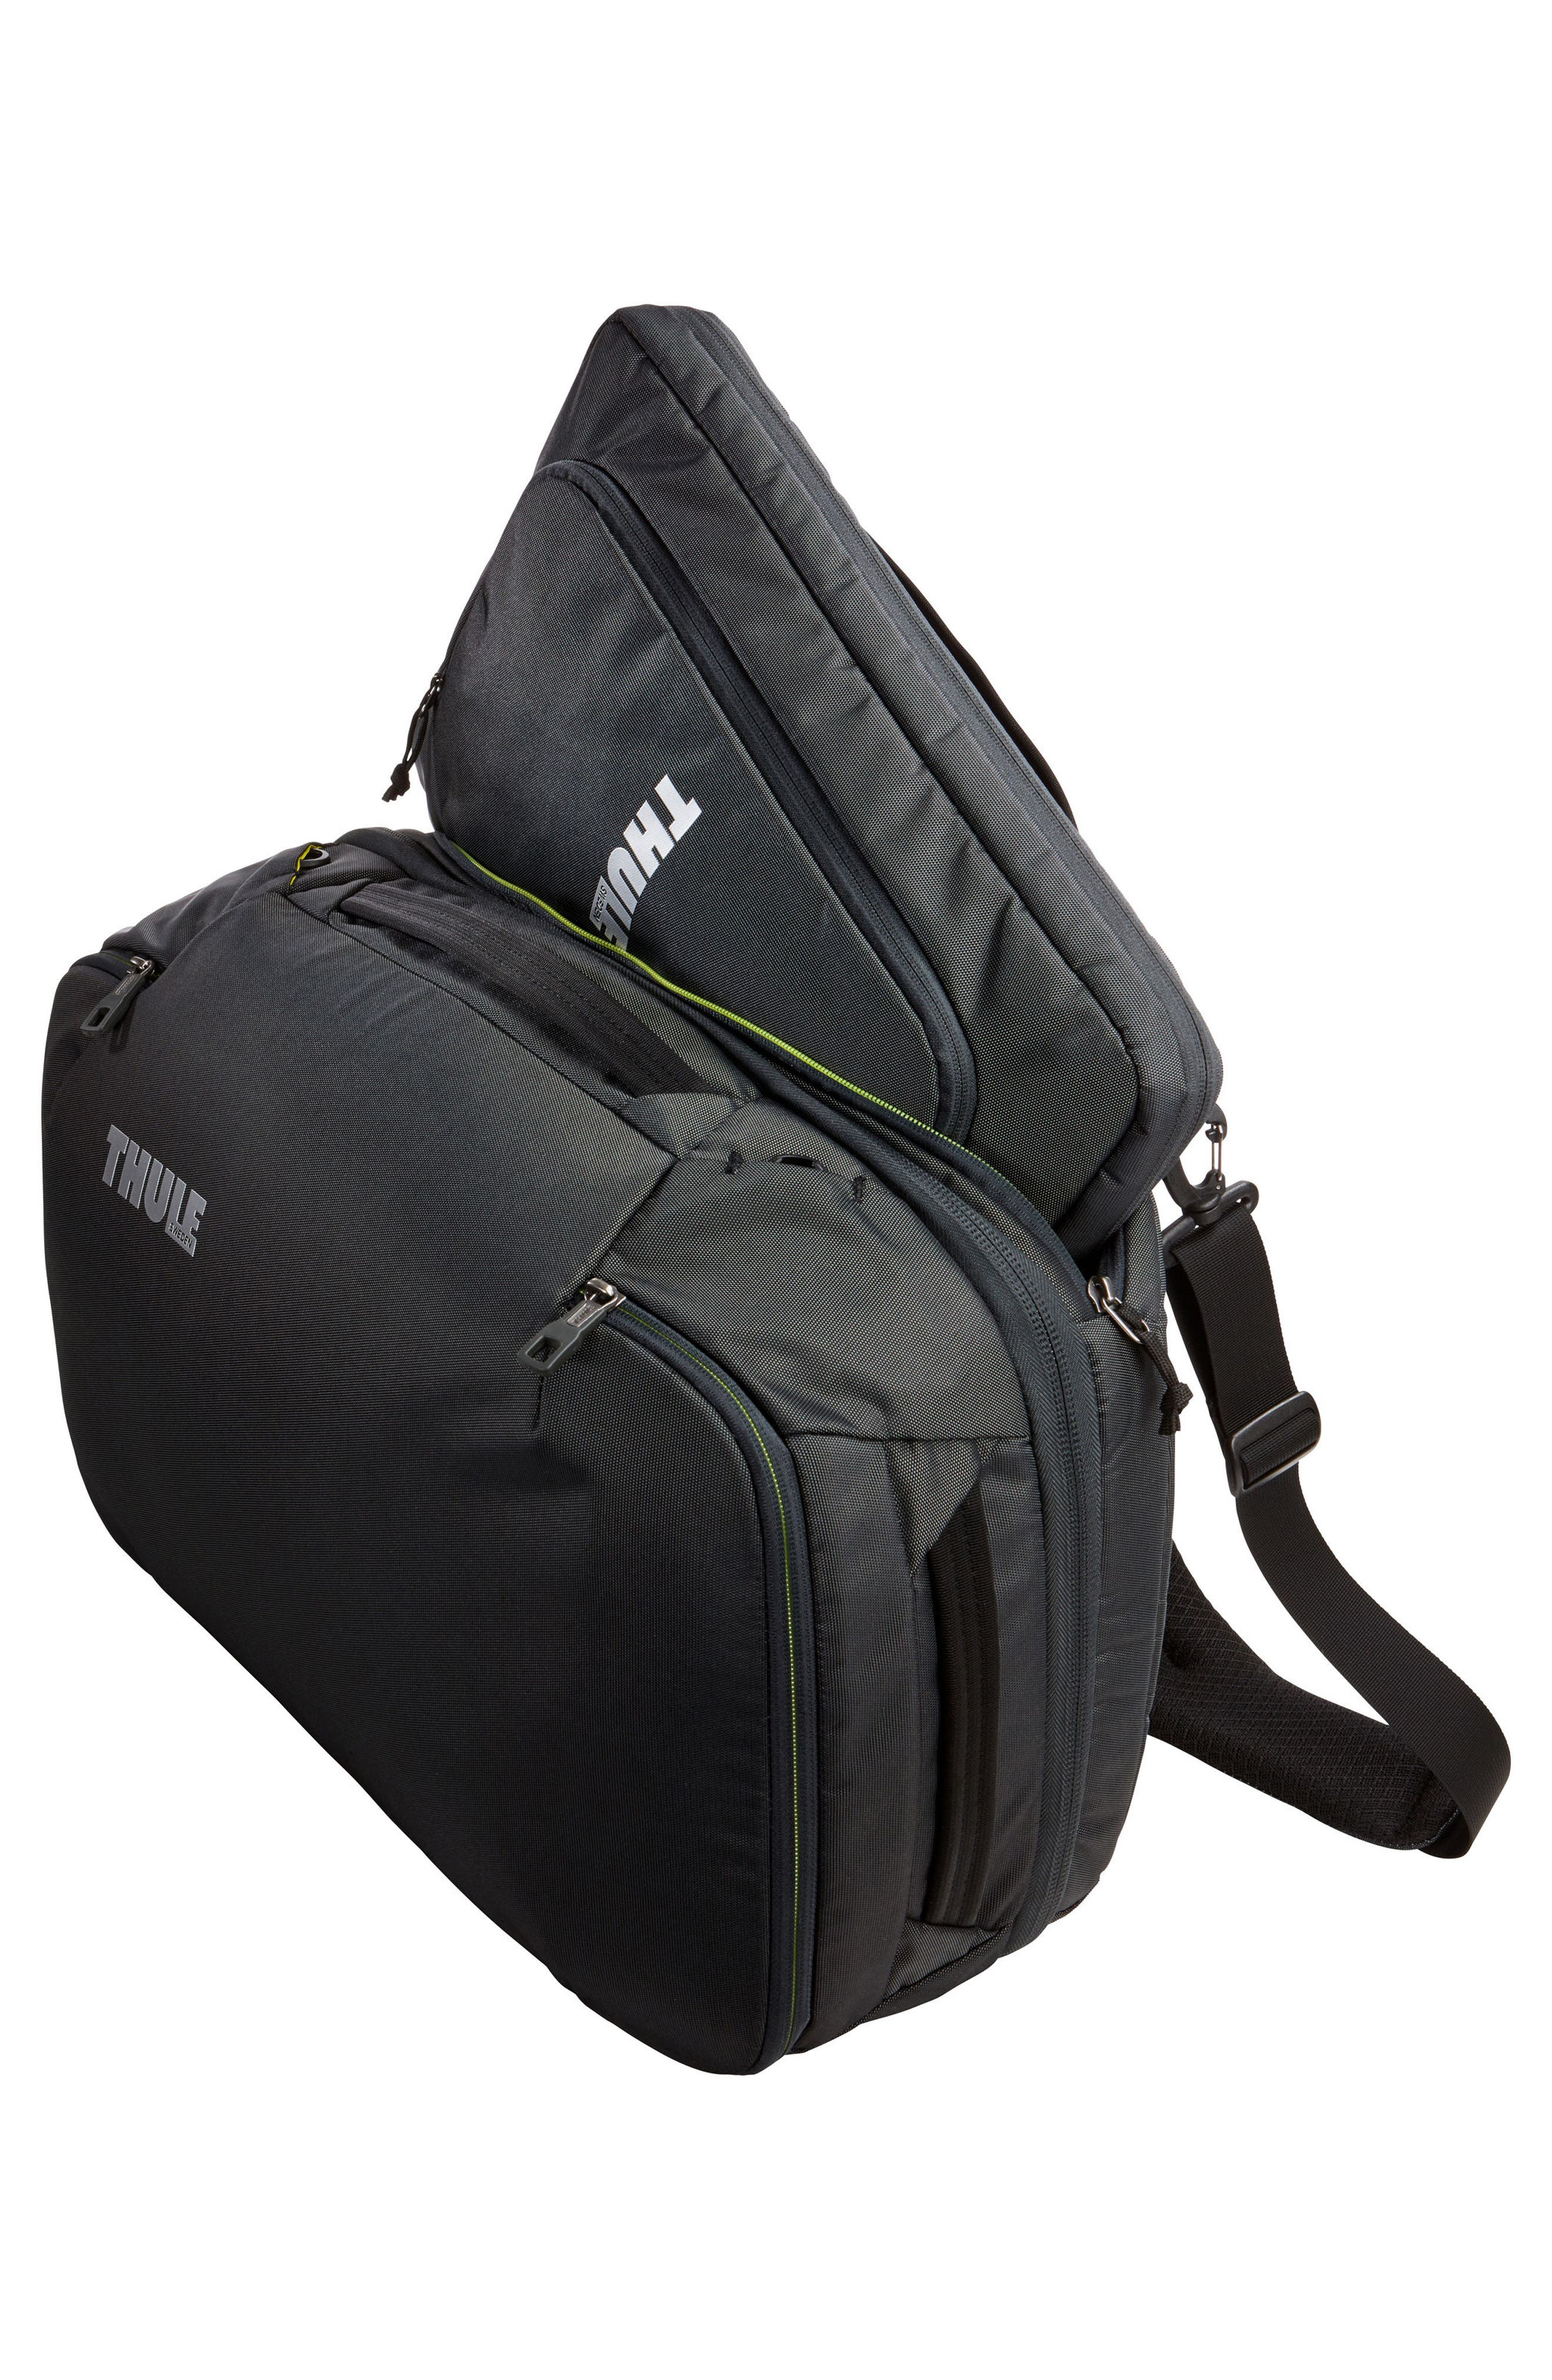 Subterra 40-Liter Convertible Duffel Bag,                             Alternate thumbnail 6, color,                             Dark Shadow